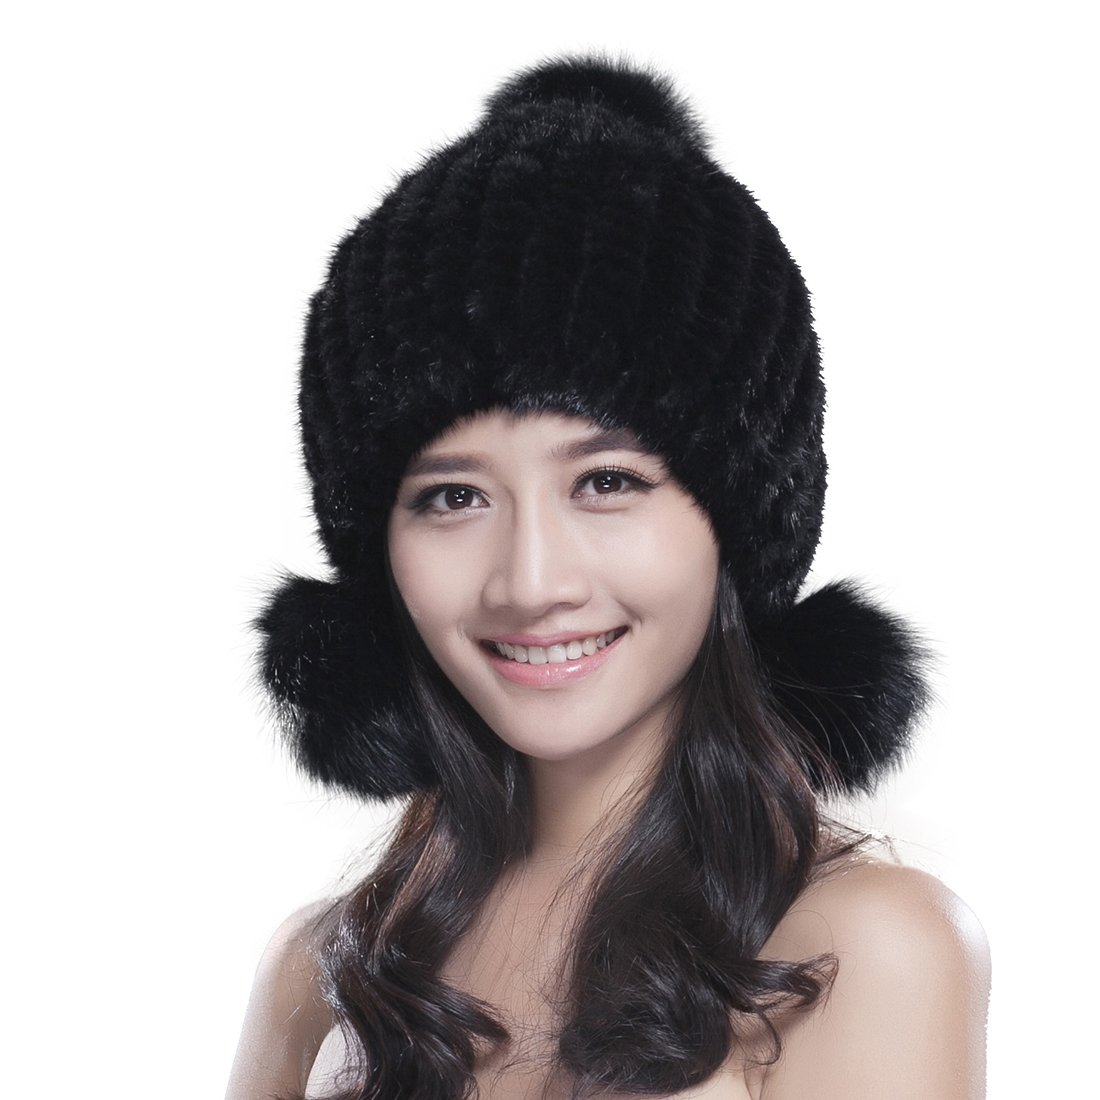 4c6aa7c594149 Amazon.com  URSFUR Women s Knit Mink Fur Hat with Earflaps Pom Poms Black   Clothing